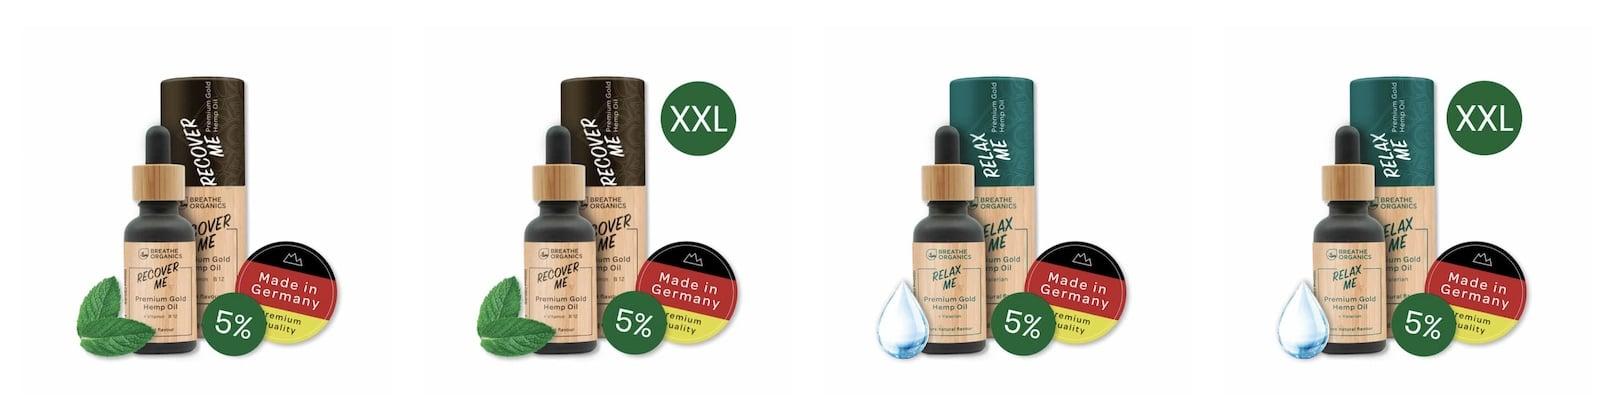 Breathe-Organics CBD-Öl Test